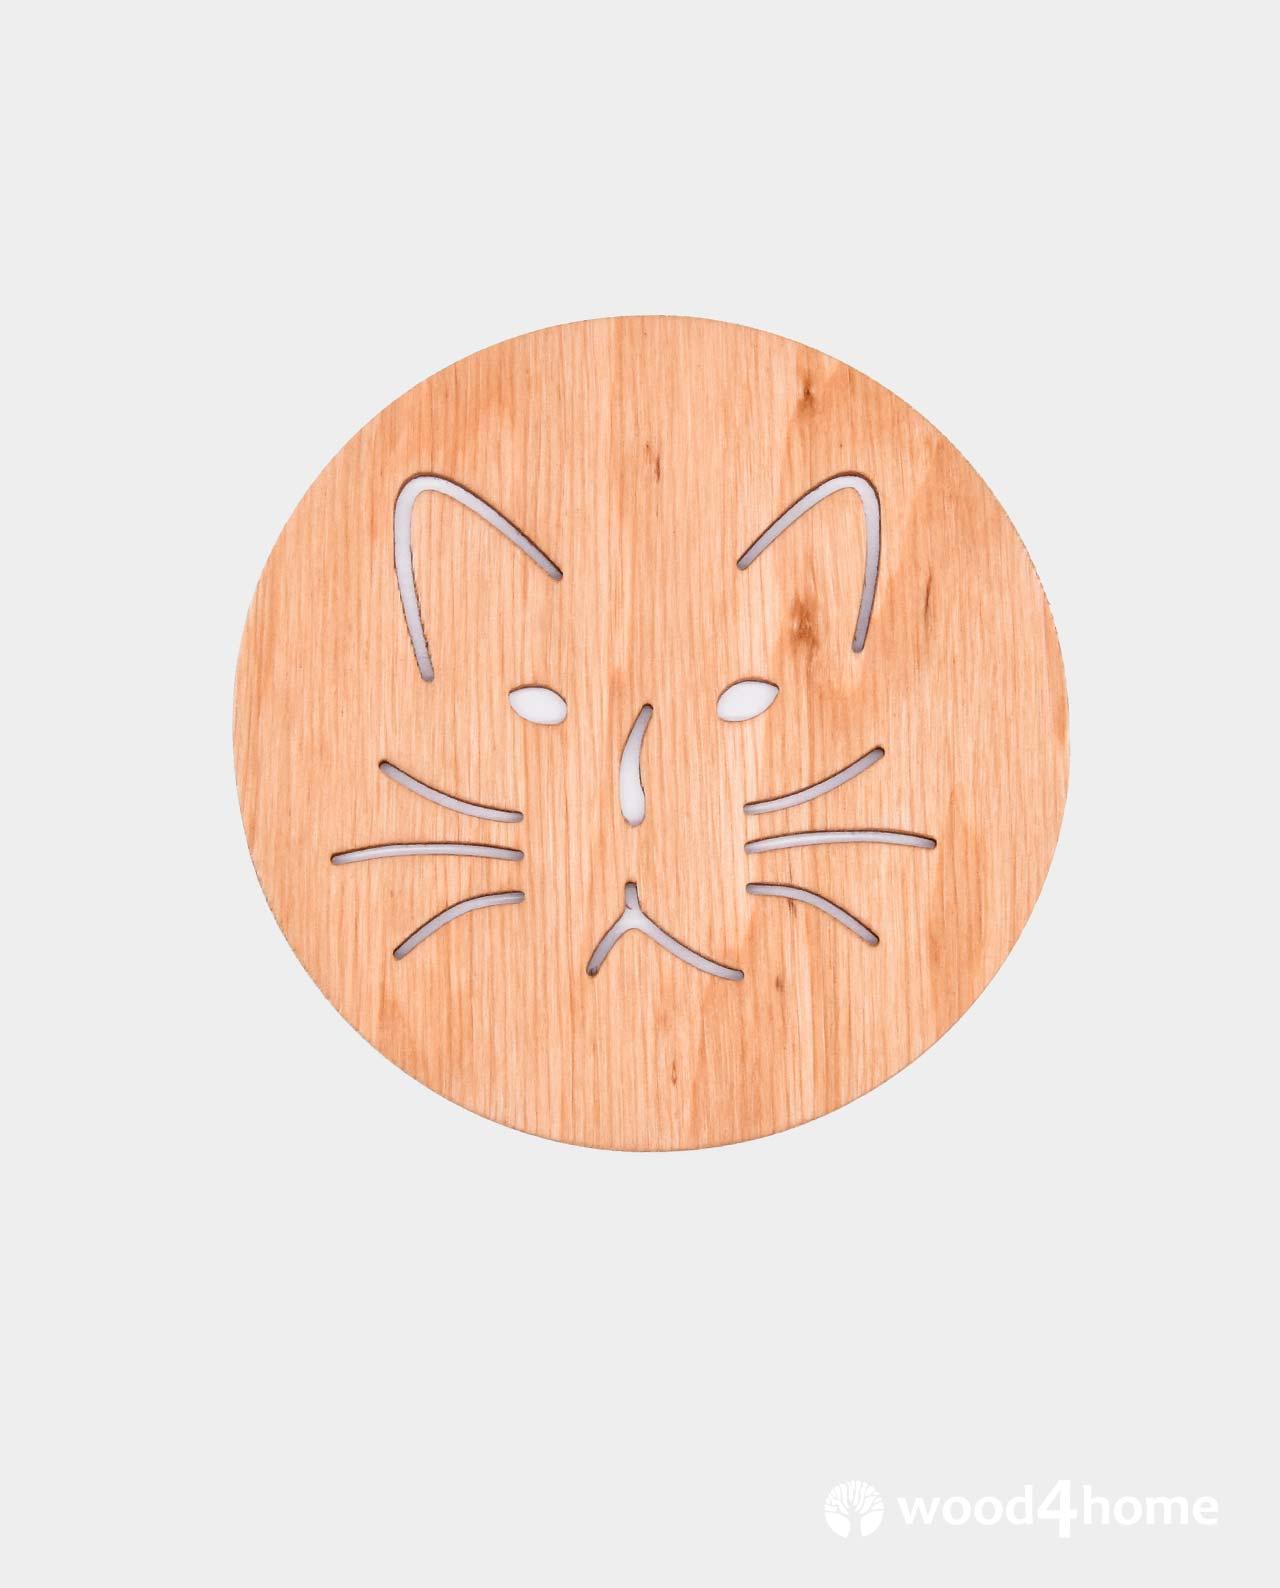 Wooden Coaster Cat : Coasters